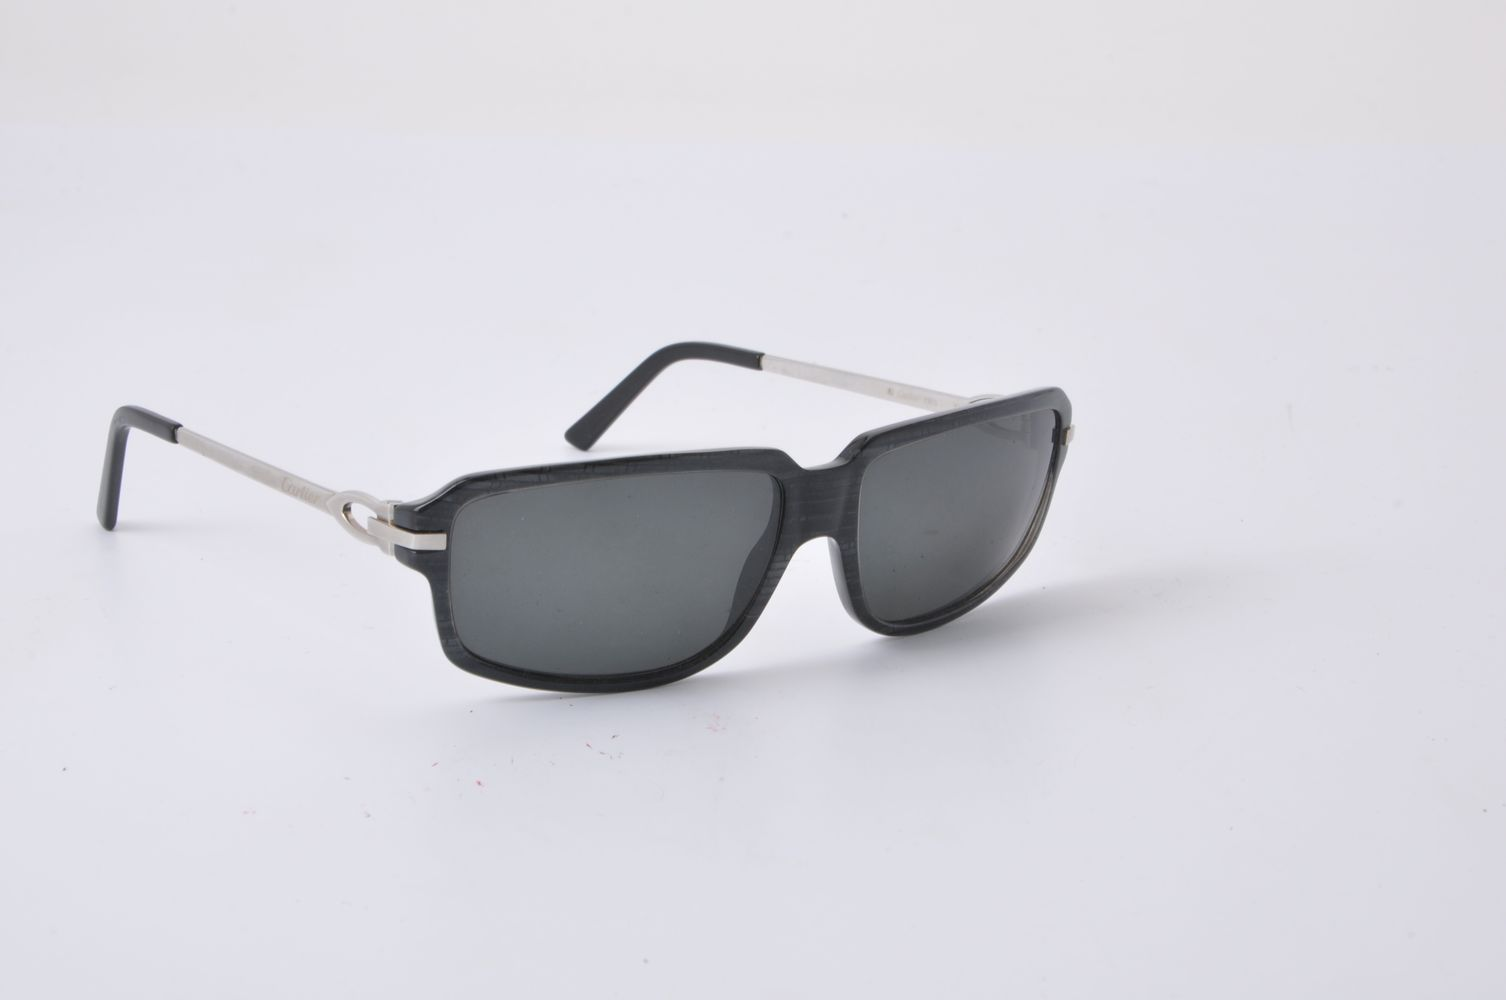 Lot 1122 - Cartier, a pair of sunglasses